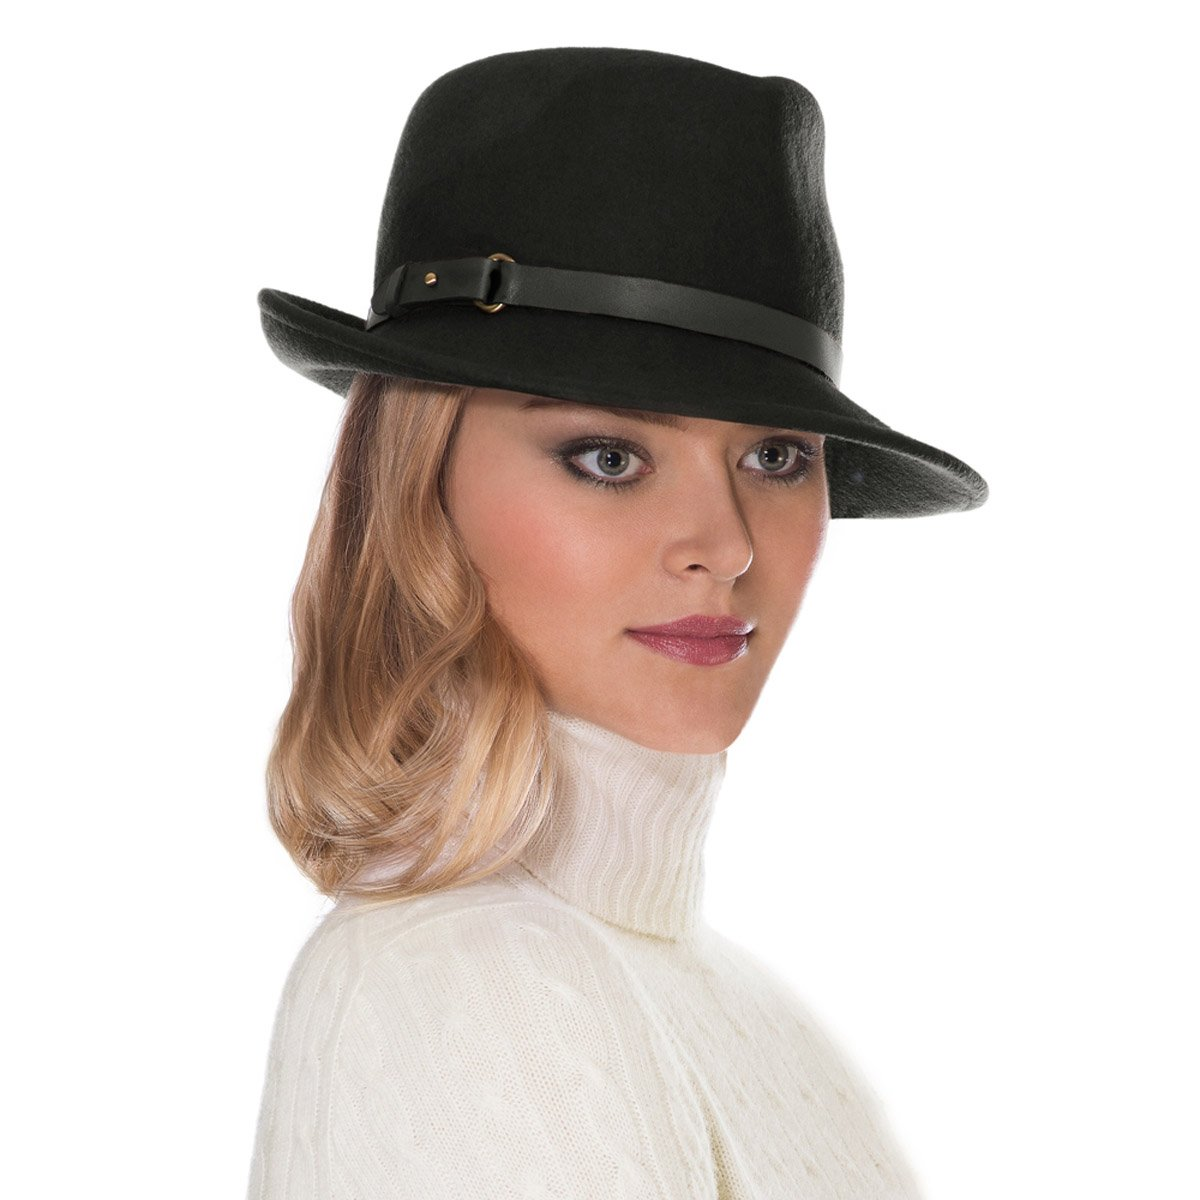 Eric Javits Luxury Fashion Designer Women's Headwear Hat - Wool Classic - Black